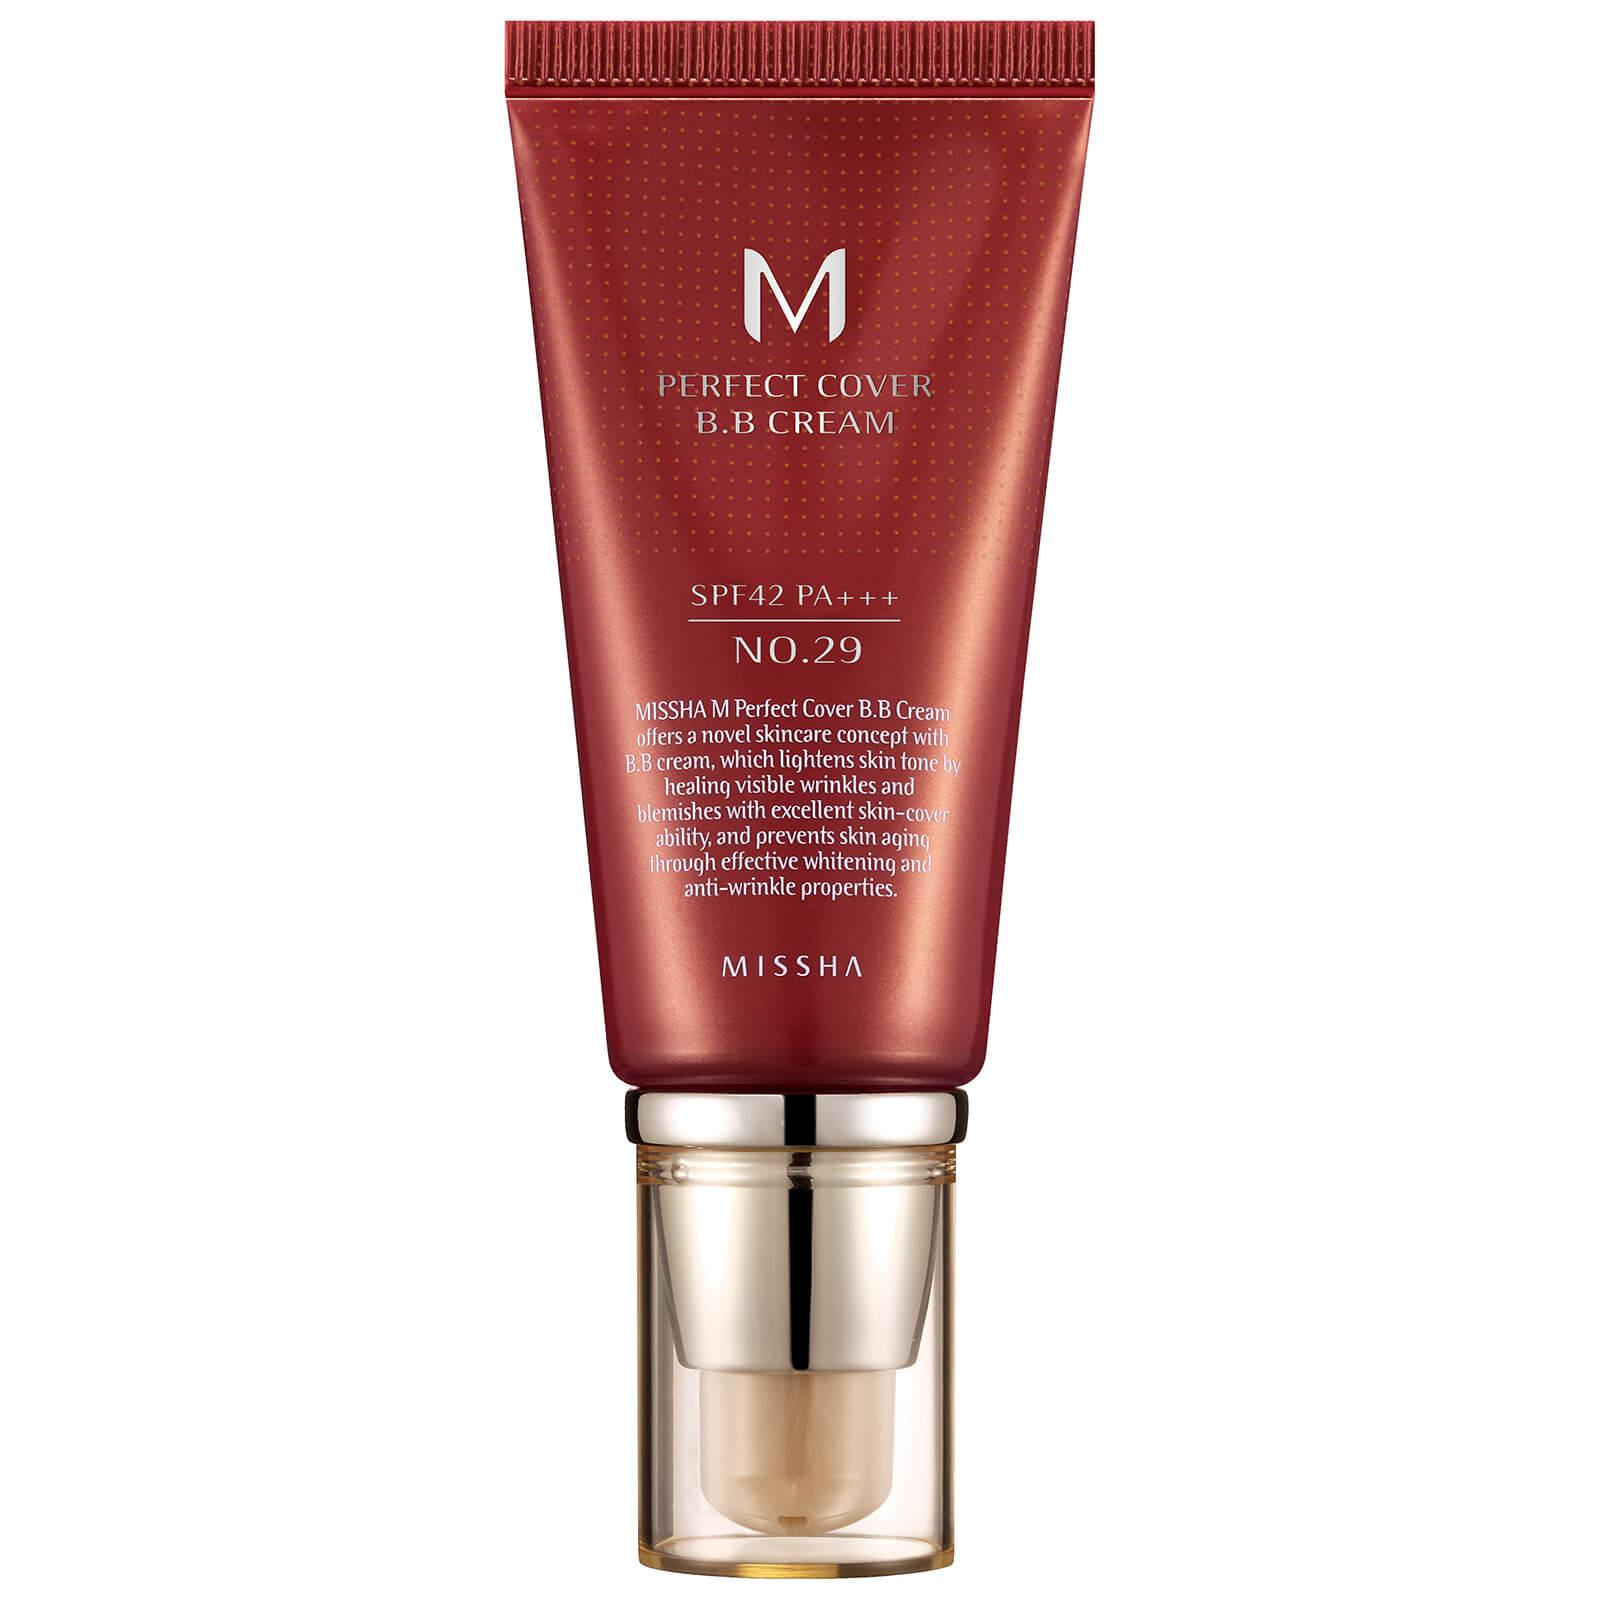 Купить MISSHA M Perfect Cover BB Cream SPF42/PA+++ - No.29/Caramel Beige 50ml